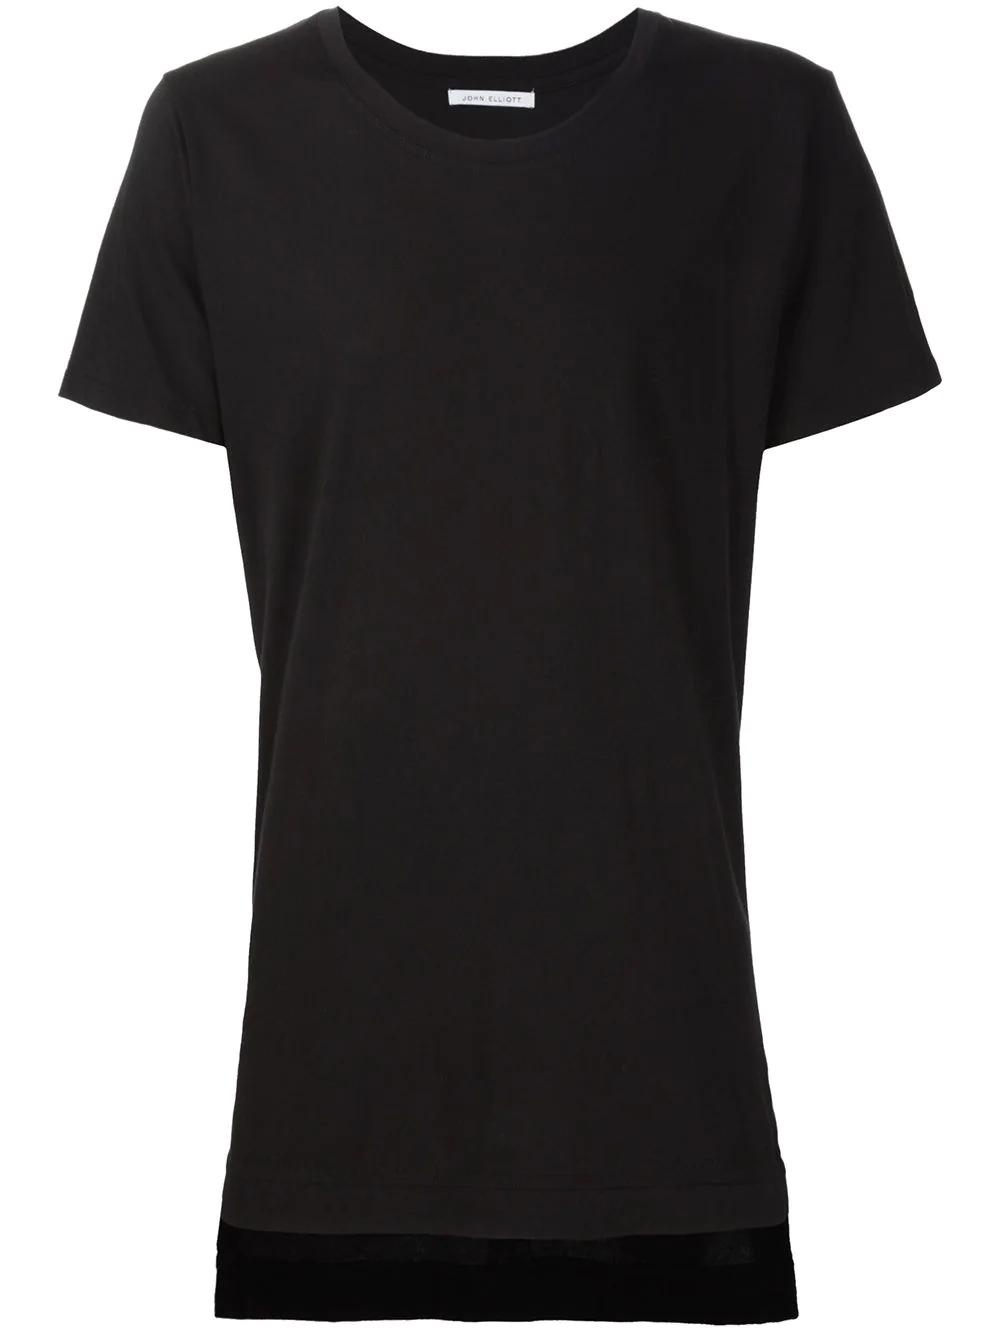 John Elliott | John Elliott футболка 'Mercer' | Clouty